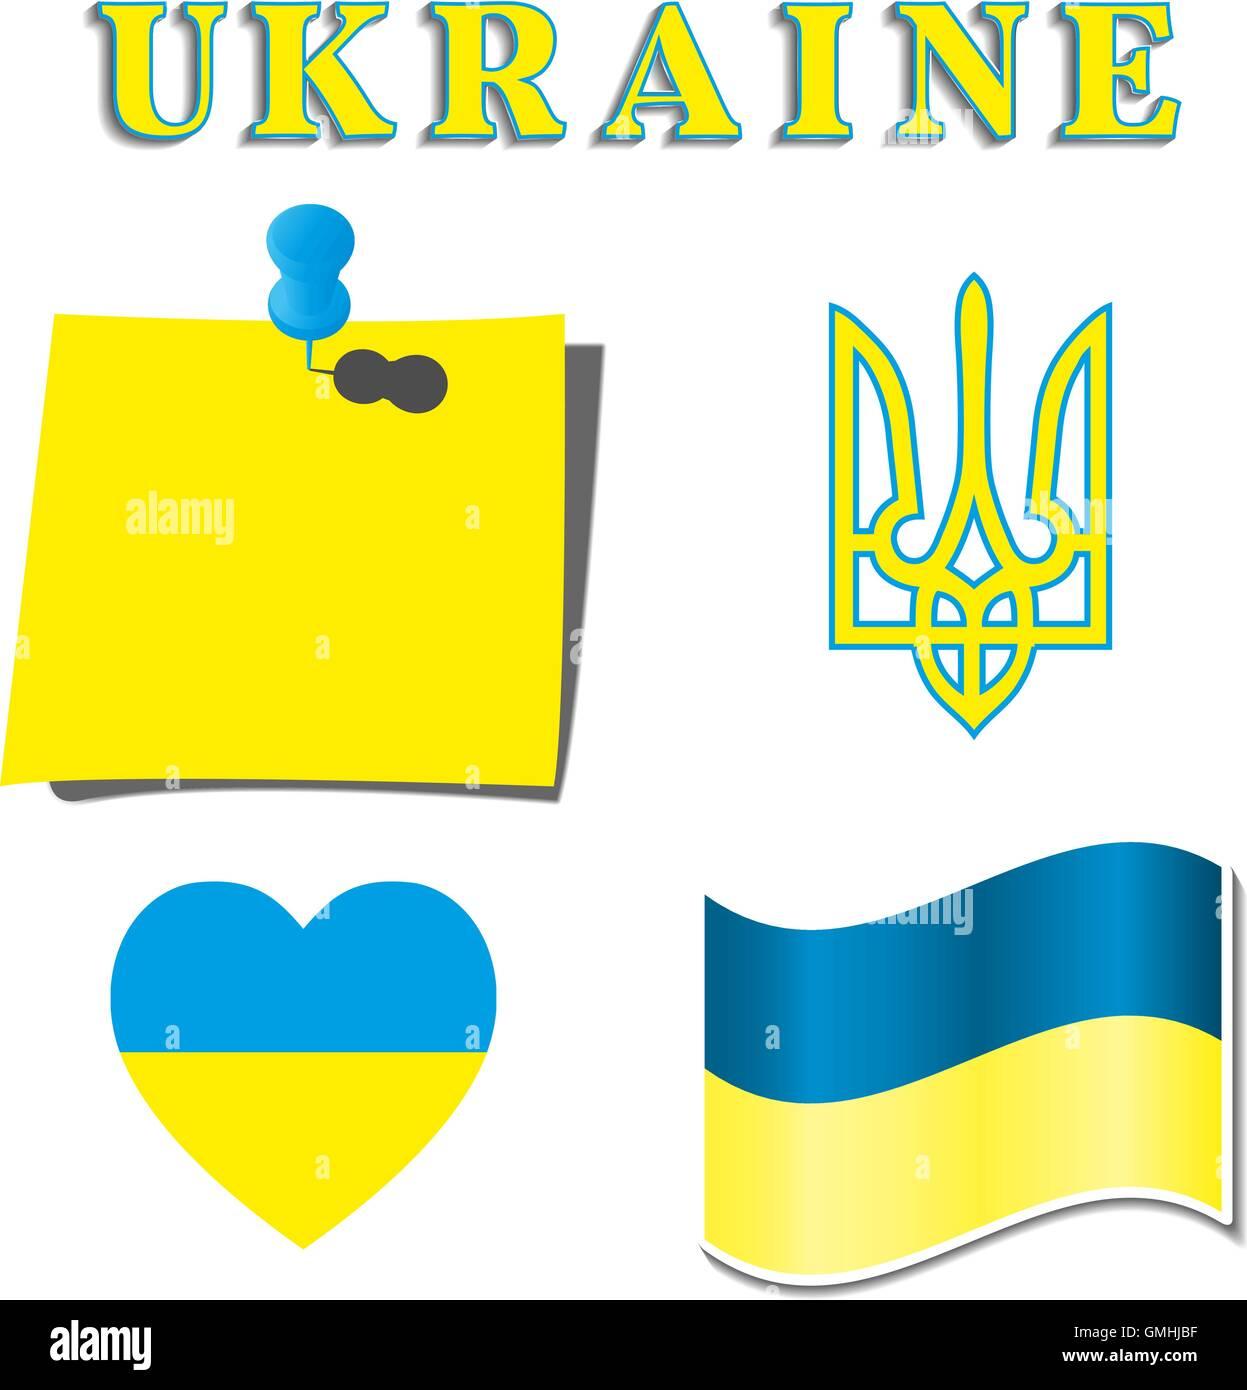 Eingestellt von ukrainischen Symbolik, Vektor-illustration Stockbild